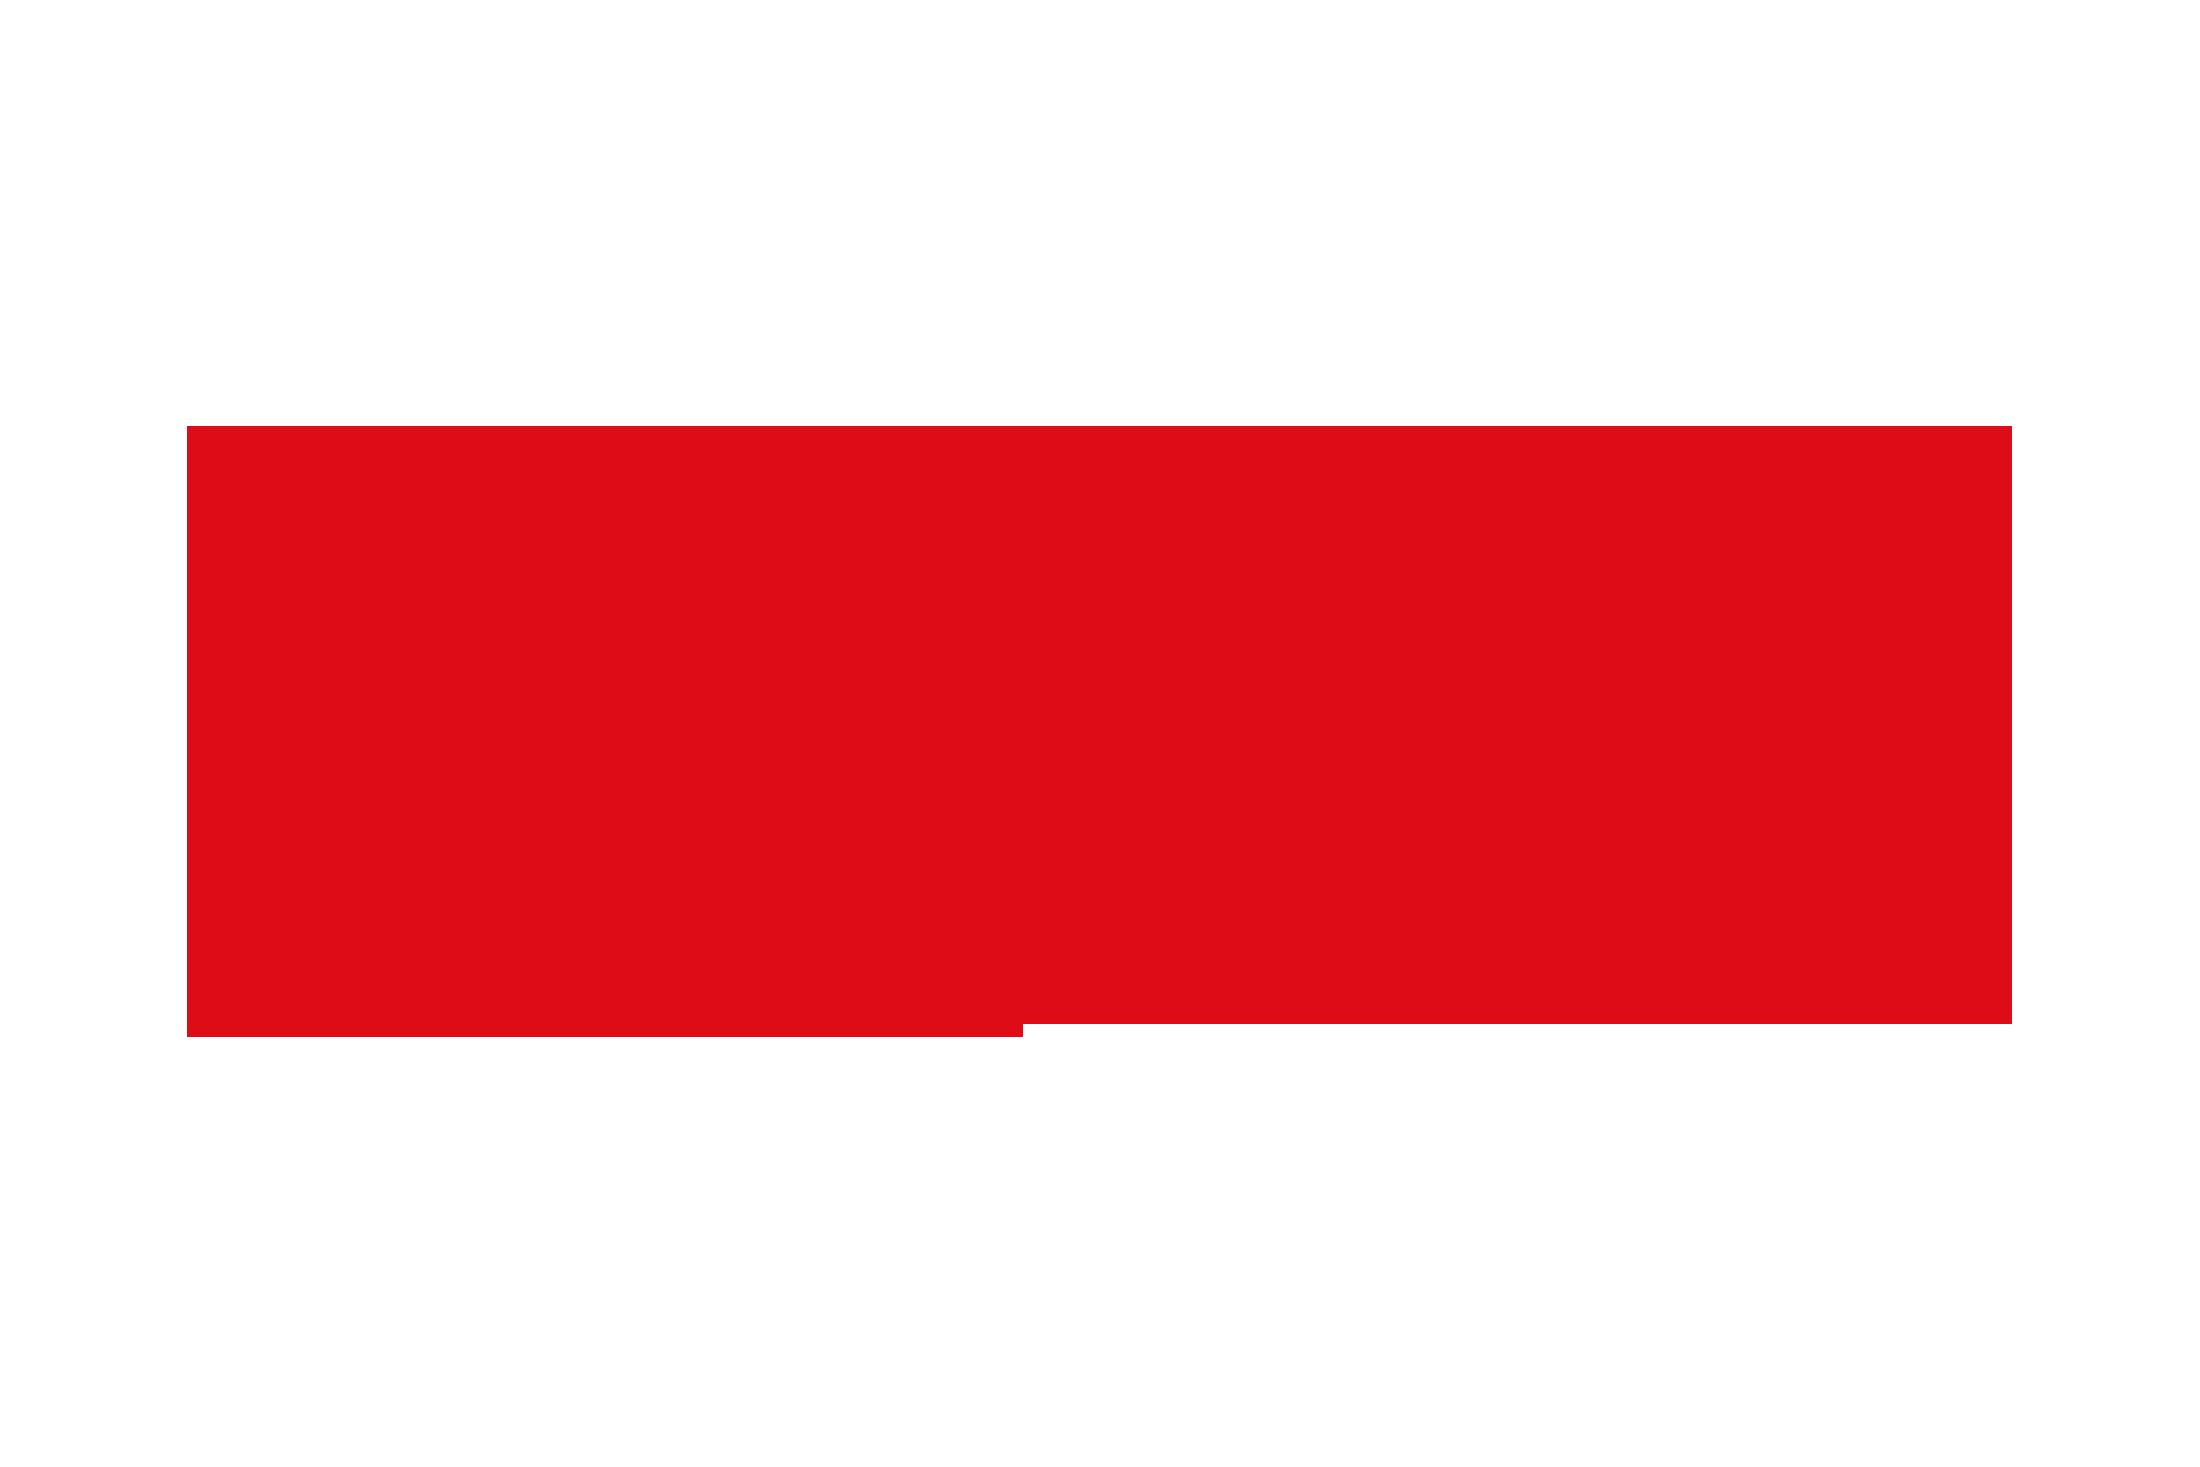 Grunge declined label PSD